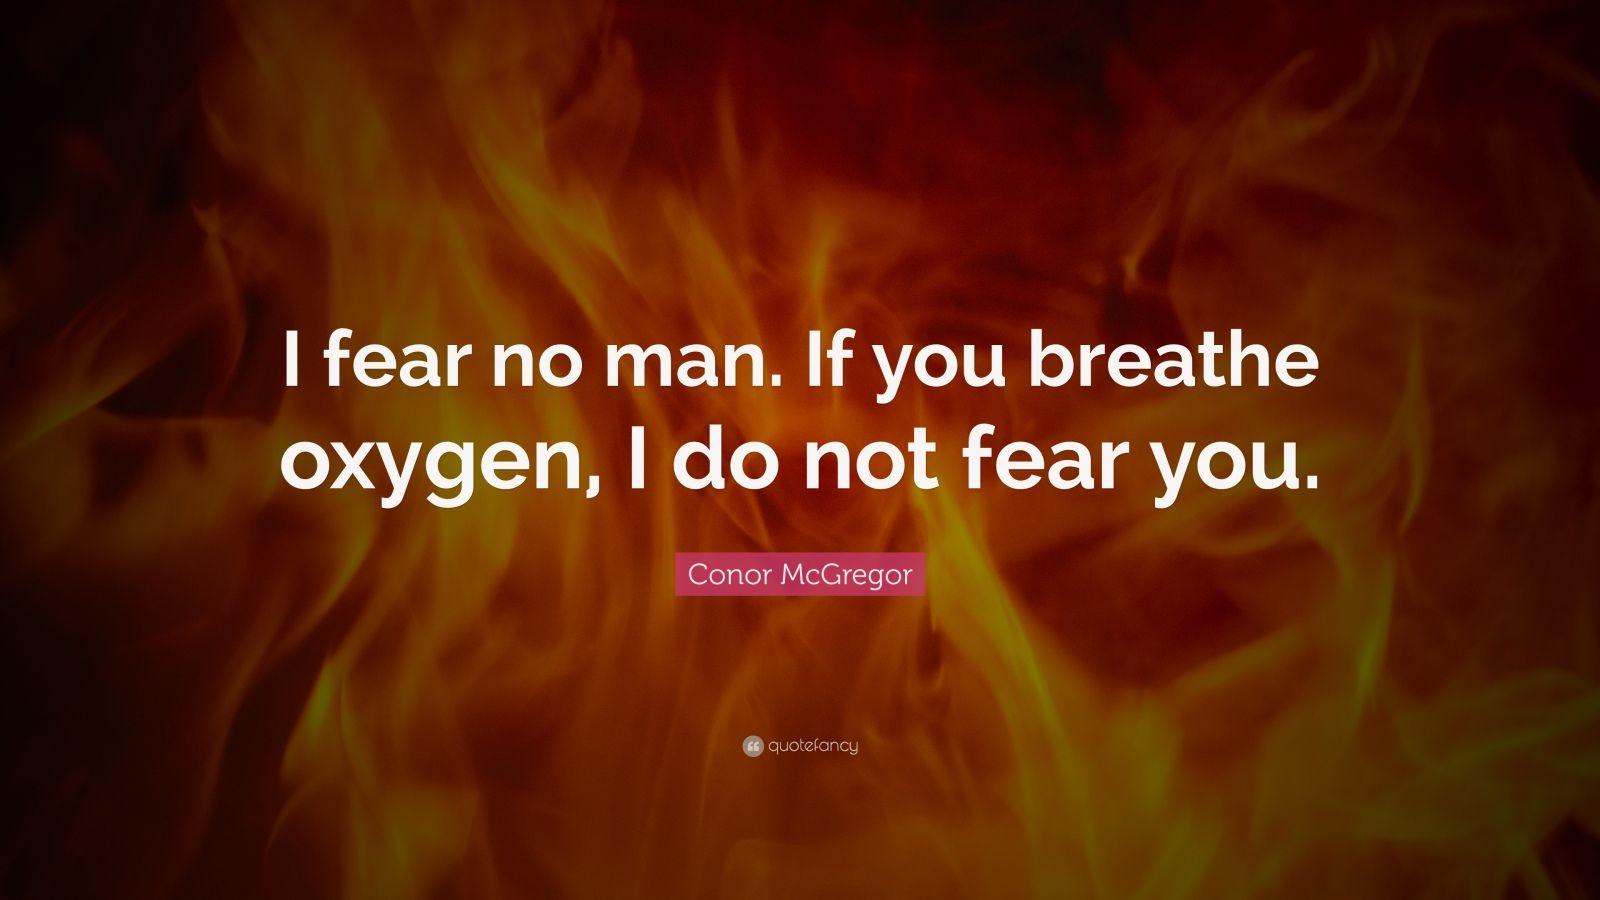 Conor Mcgregor Quotes Wallpapers Conor Mcgregor Quote I Fear No Man If You Breathe